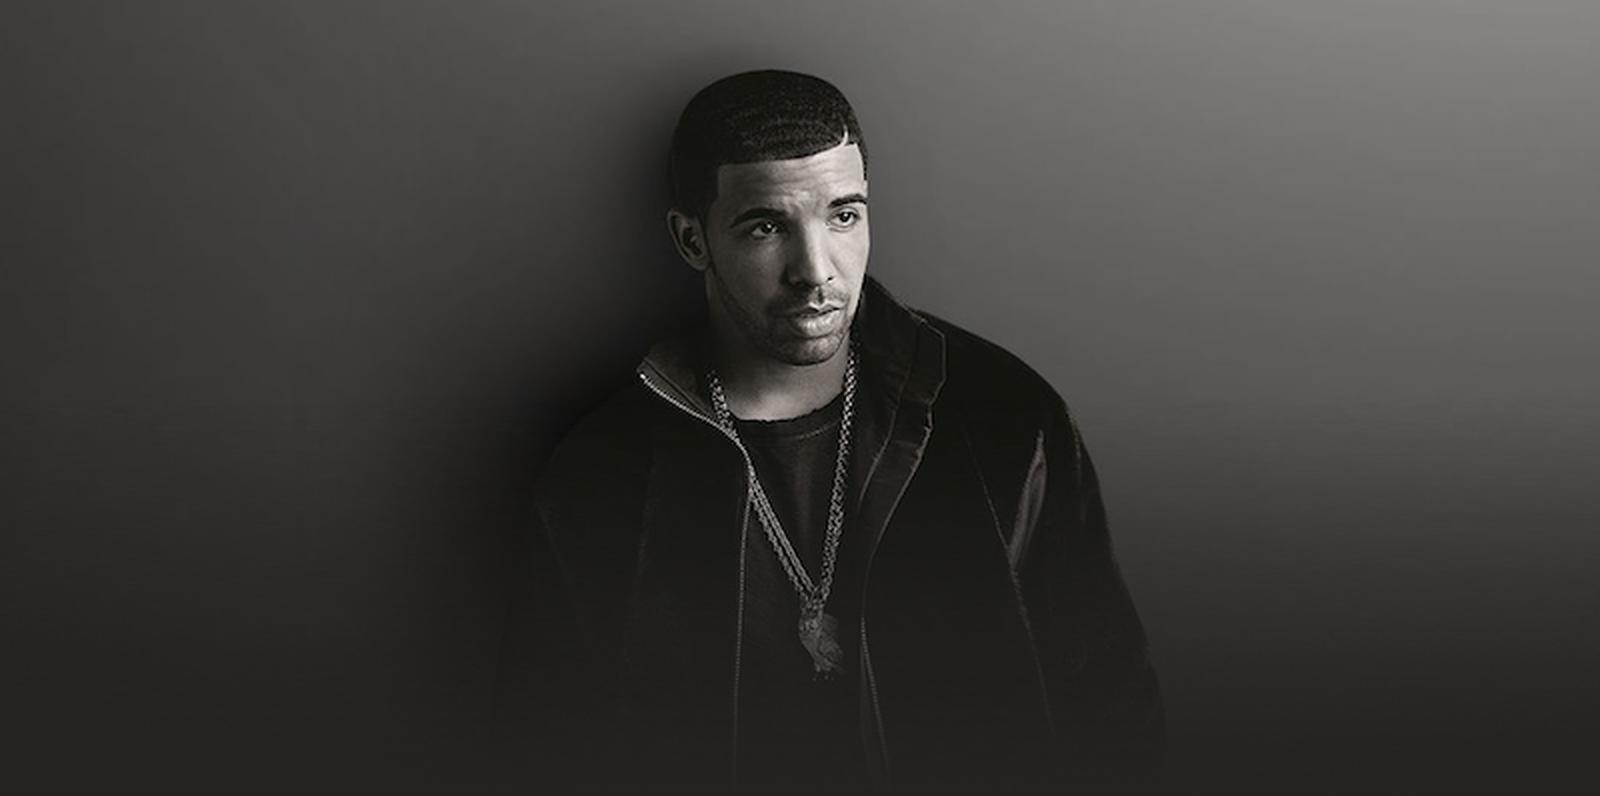 Drake Album 'Certified Lover Boy' Breaks Apple Music's One-Day Streaming Record